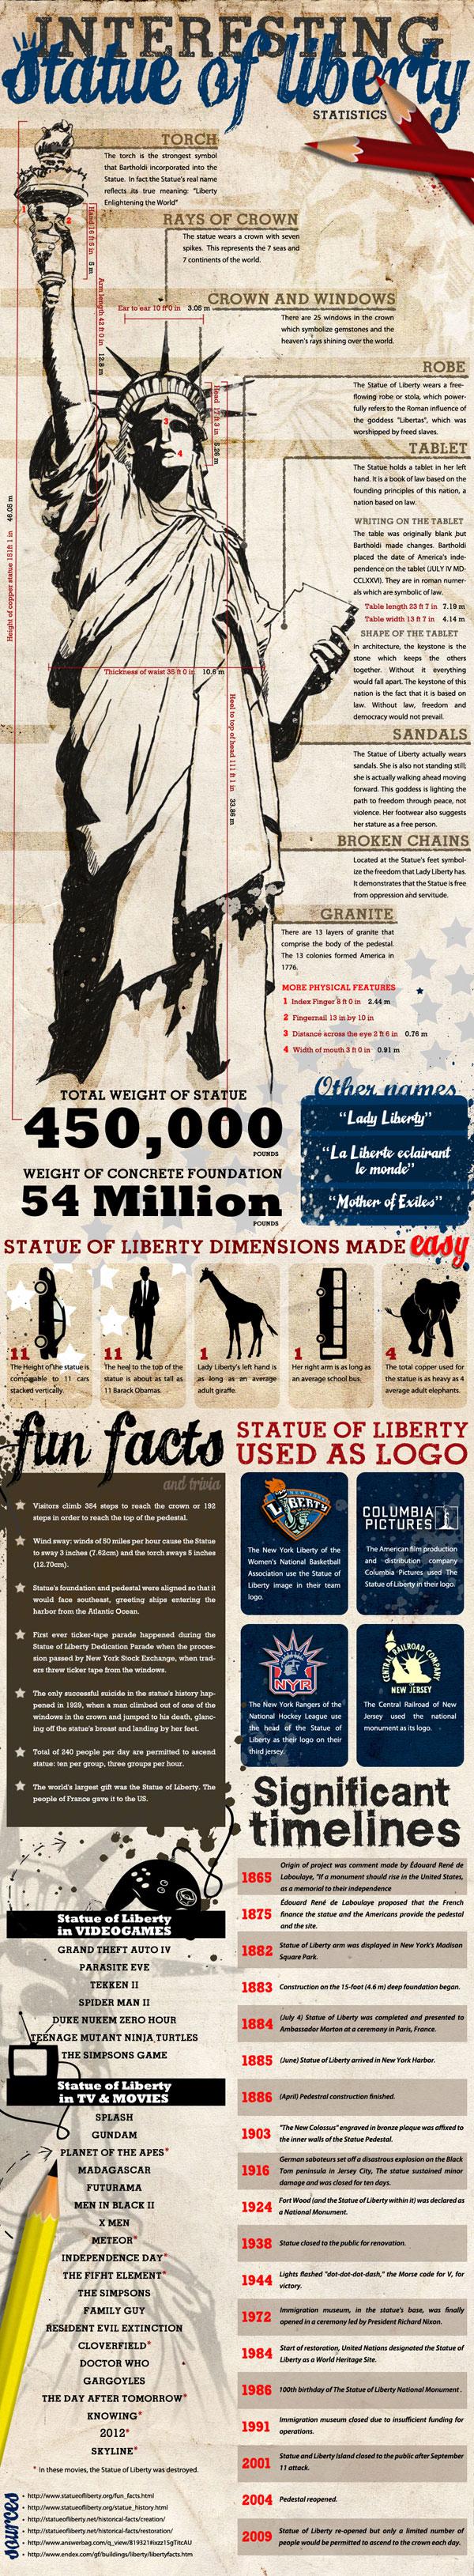 20110119-1-Interesting_Statue_of_Liberty_Statistics